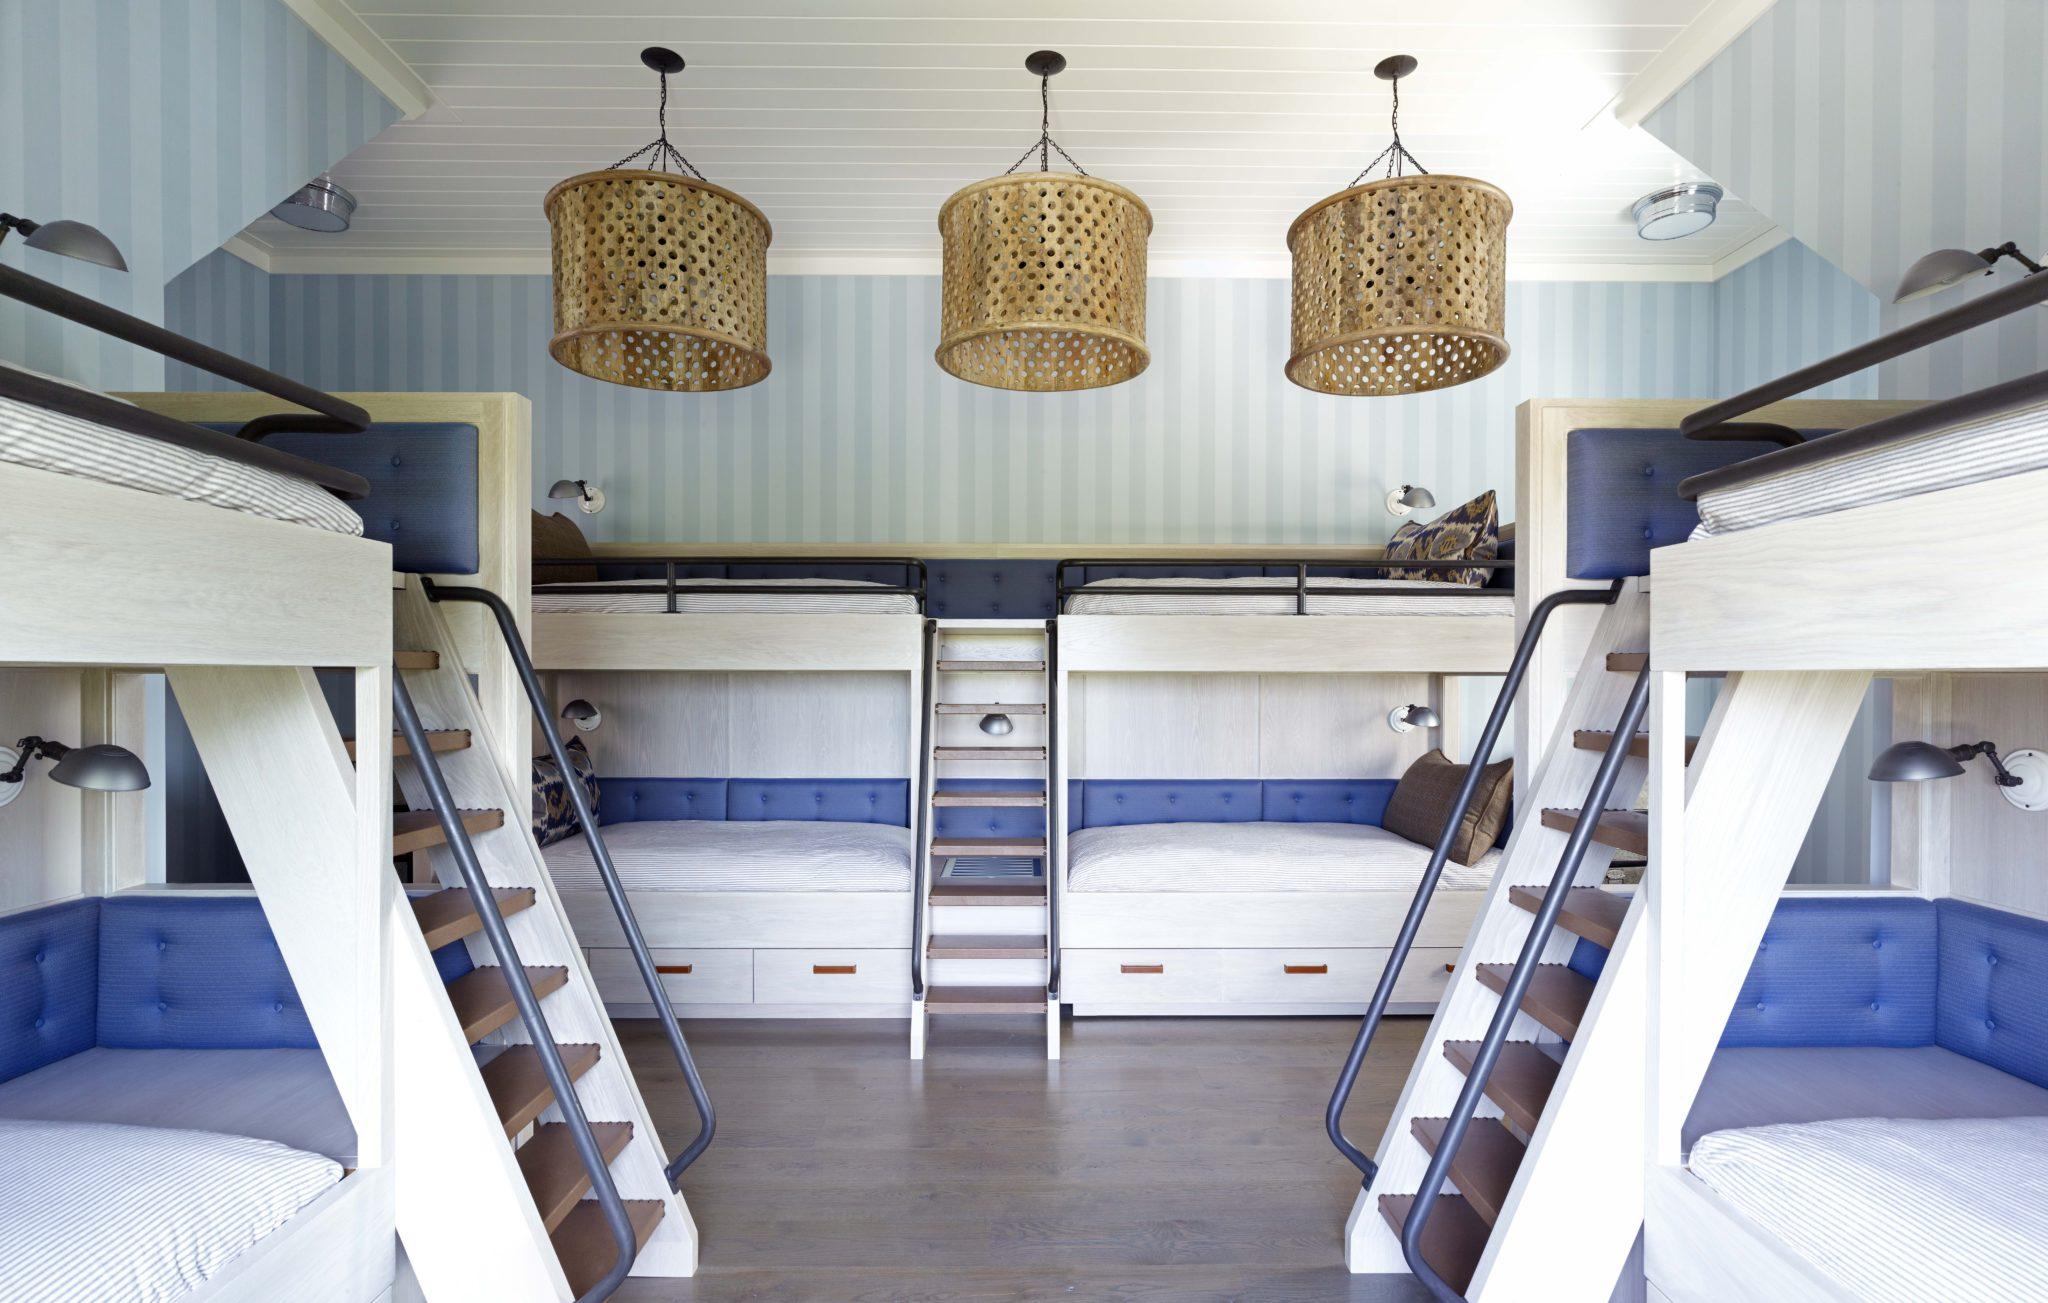 Bridgehampton Residence, Kid's Bunk Room w/ custom designed bunks & storage by Stephens Design Group